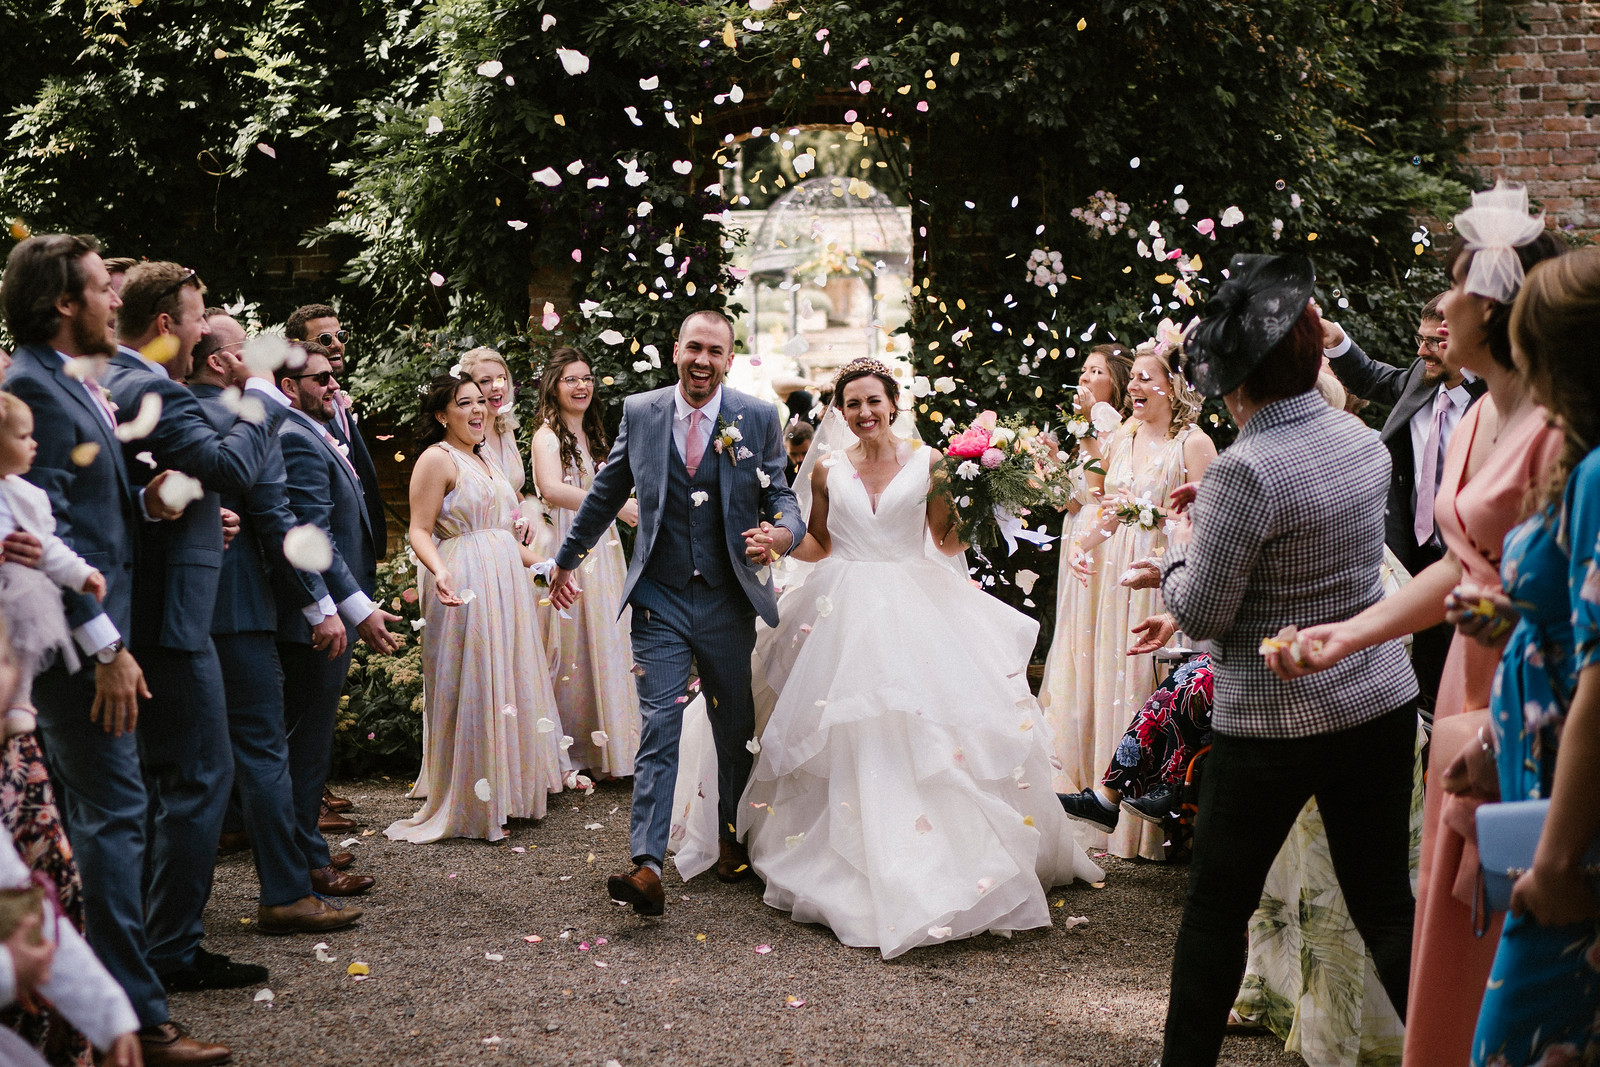 Bride and Groom Confetti Wedding Photo